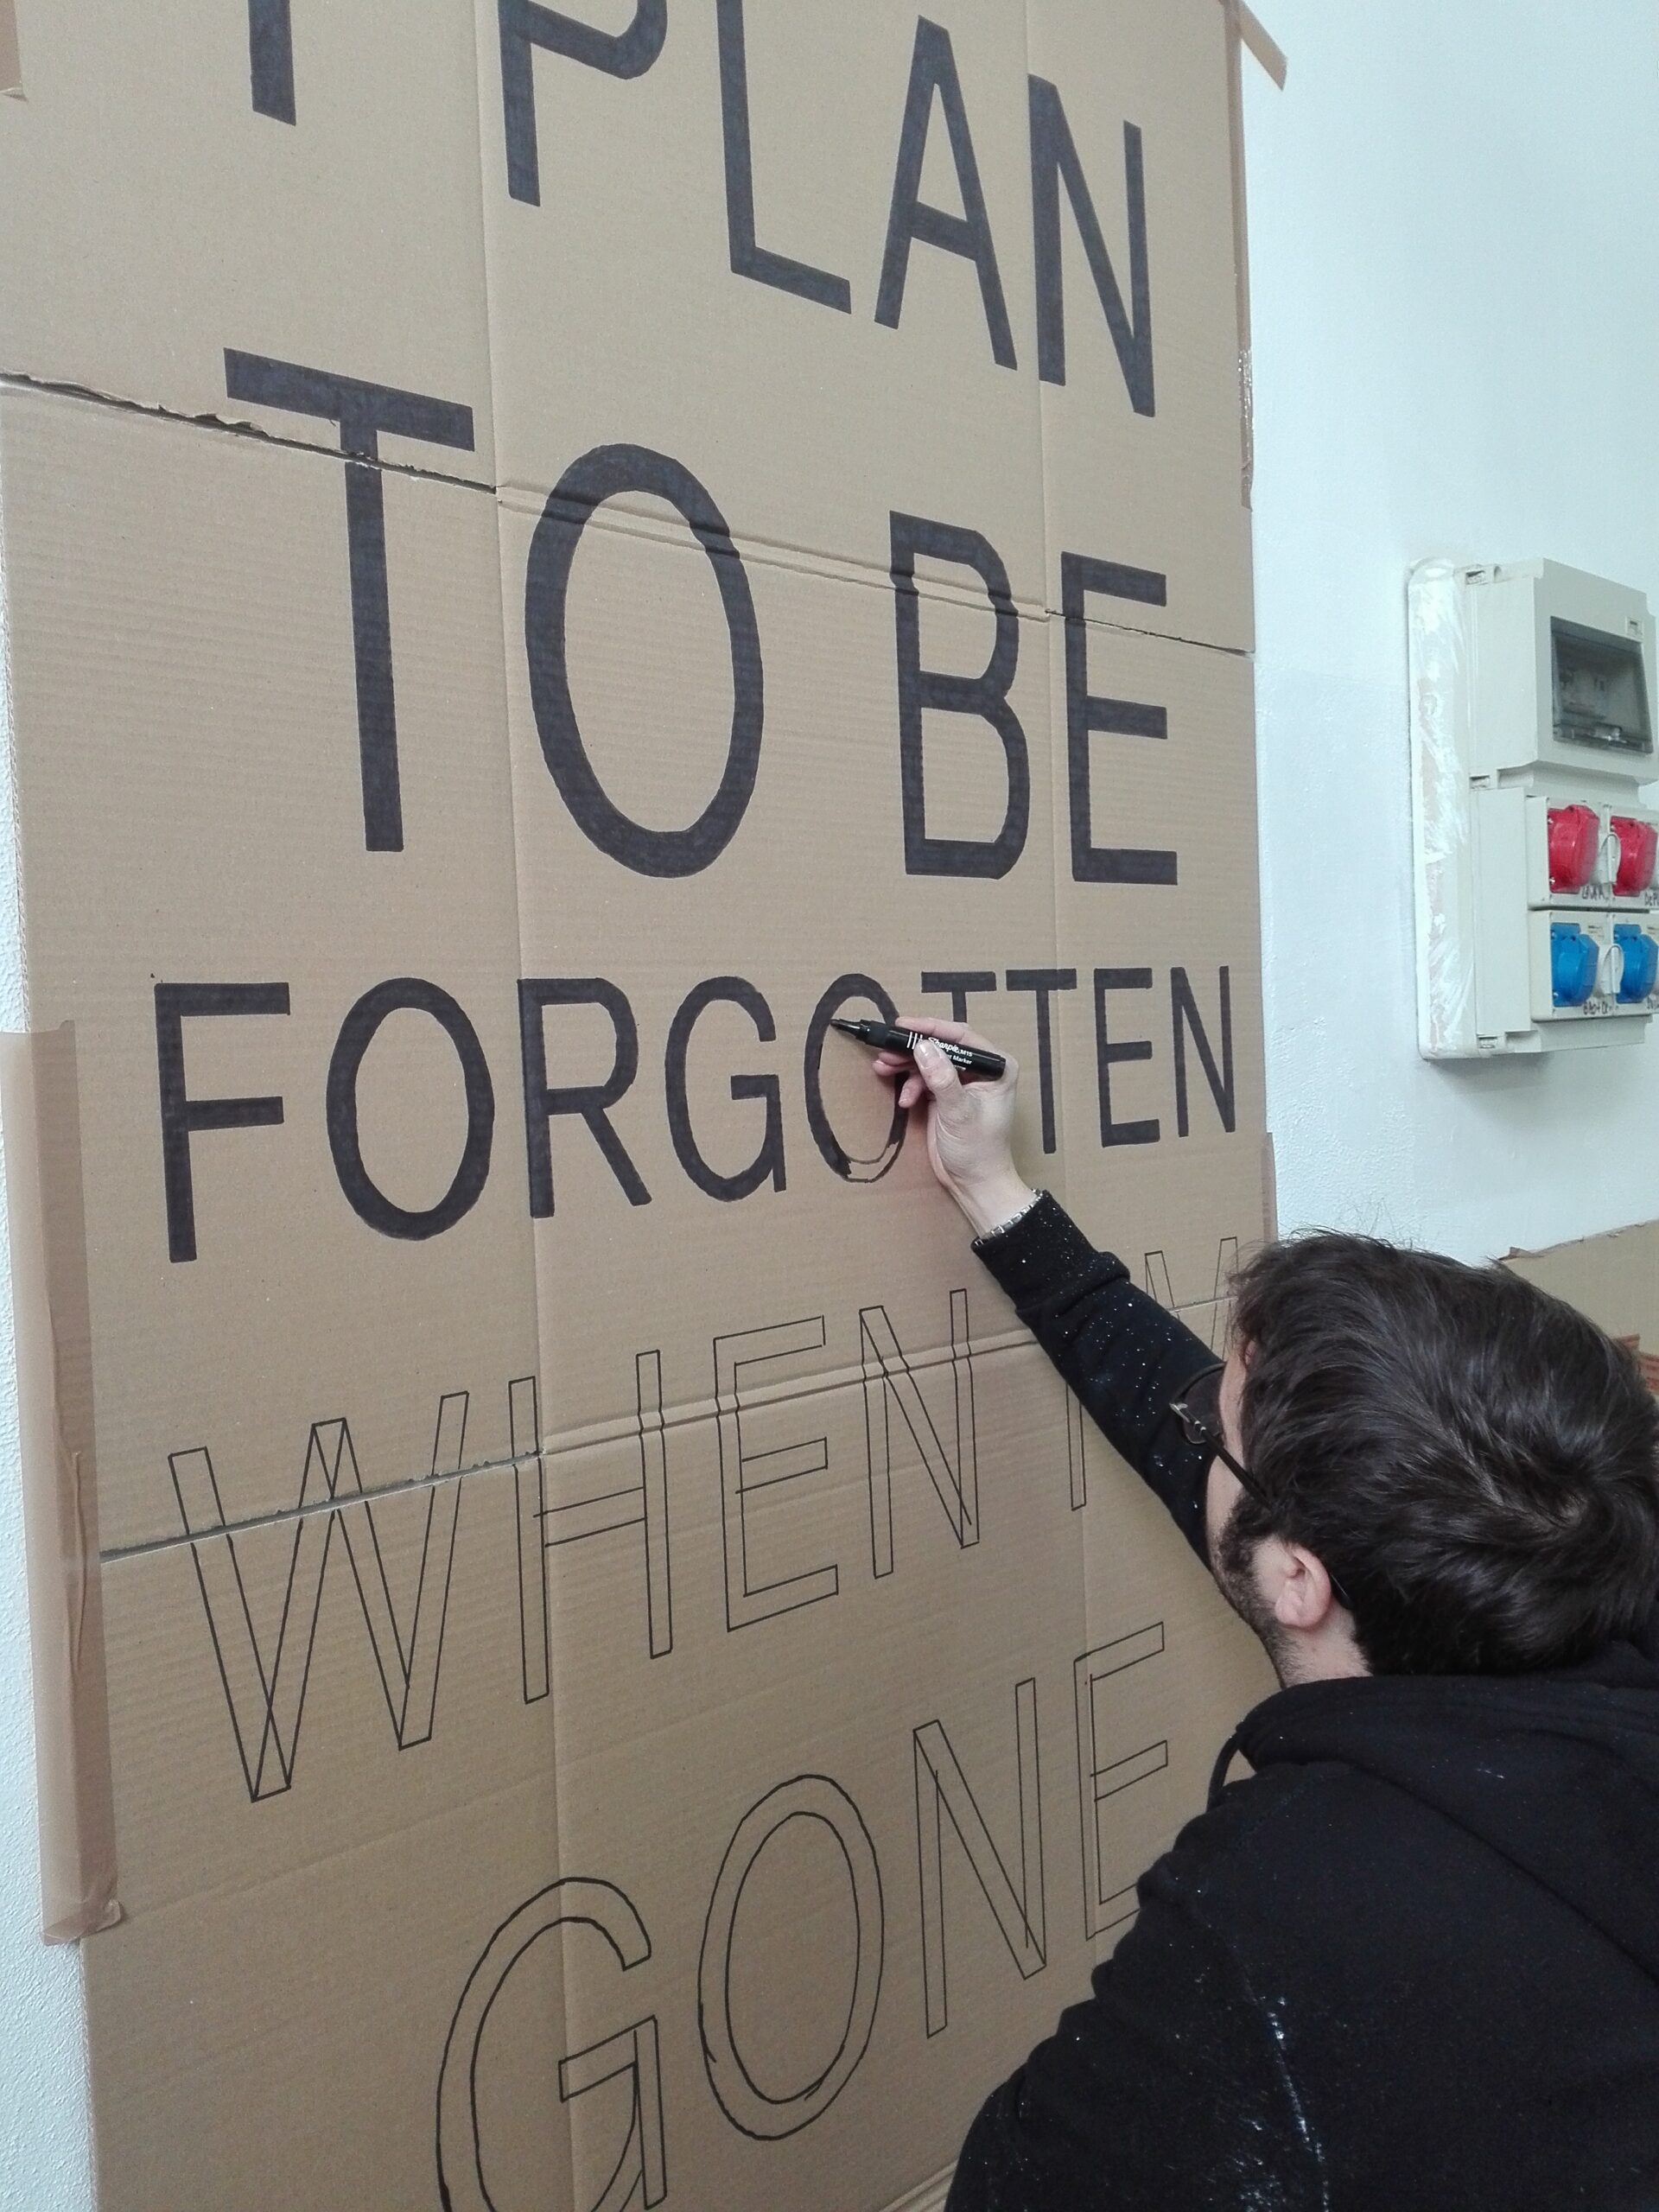 Fabrice Bernasconi Borzì - I plan to be forgotten when I'm gone